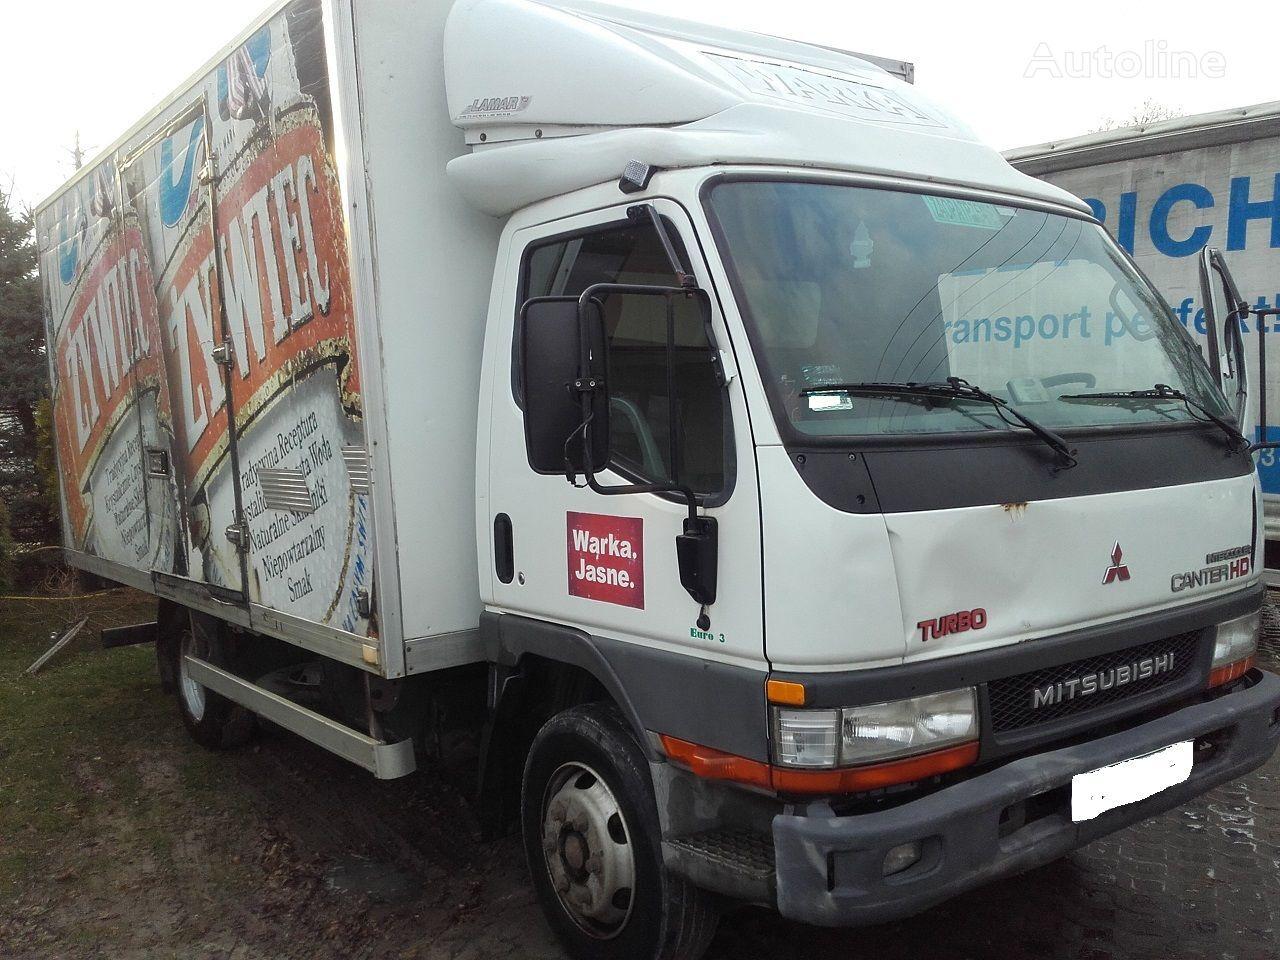 MITSUBISHI CANTER 3.9 HD camion furgon